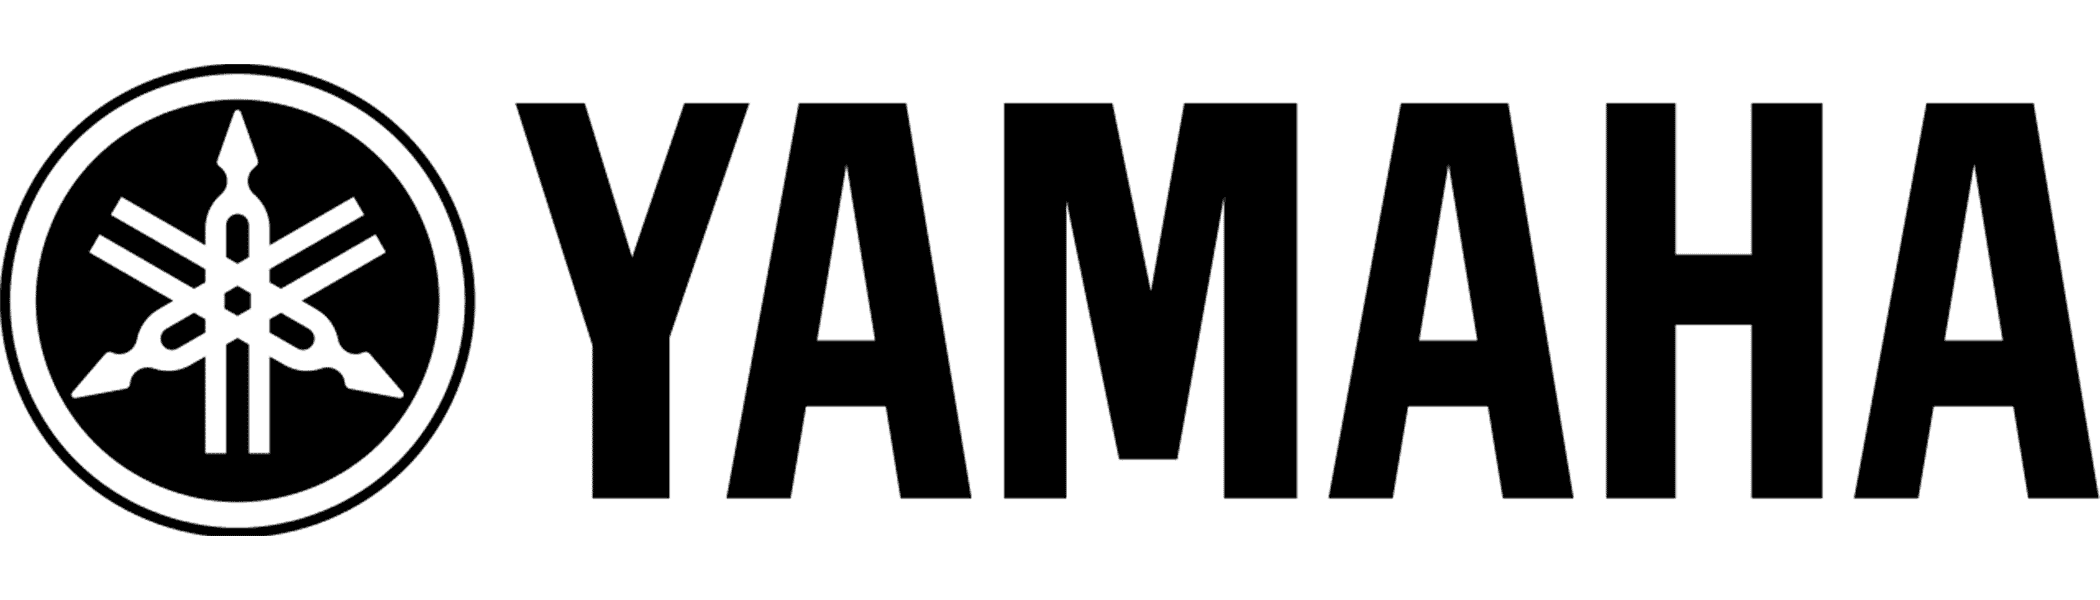 Yamaha Pro Audio højttalere mixere